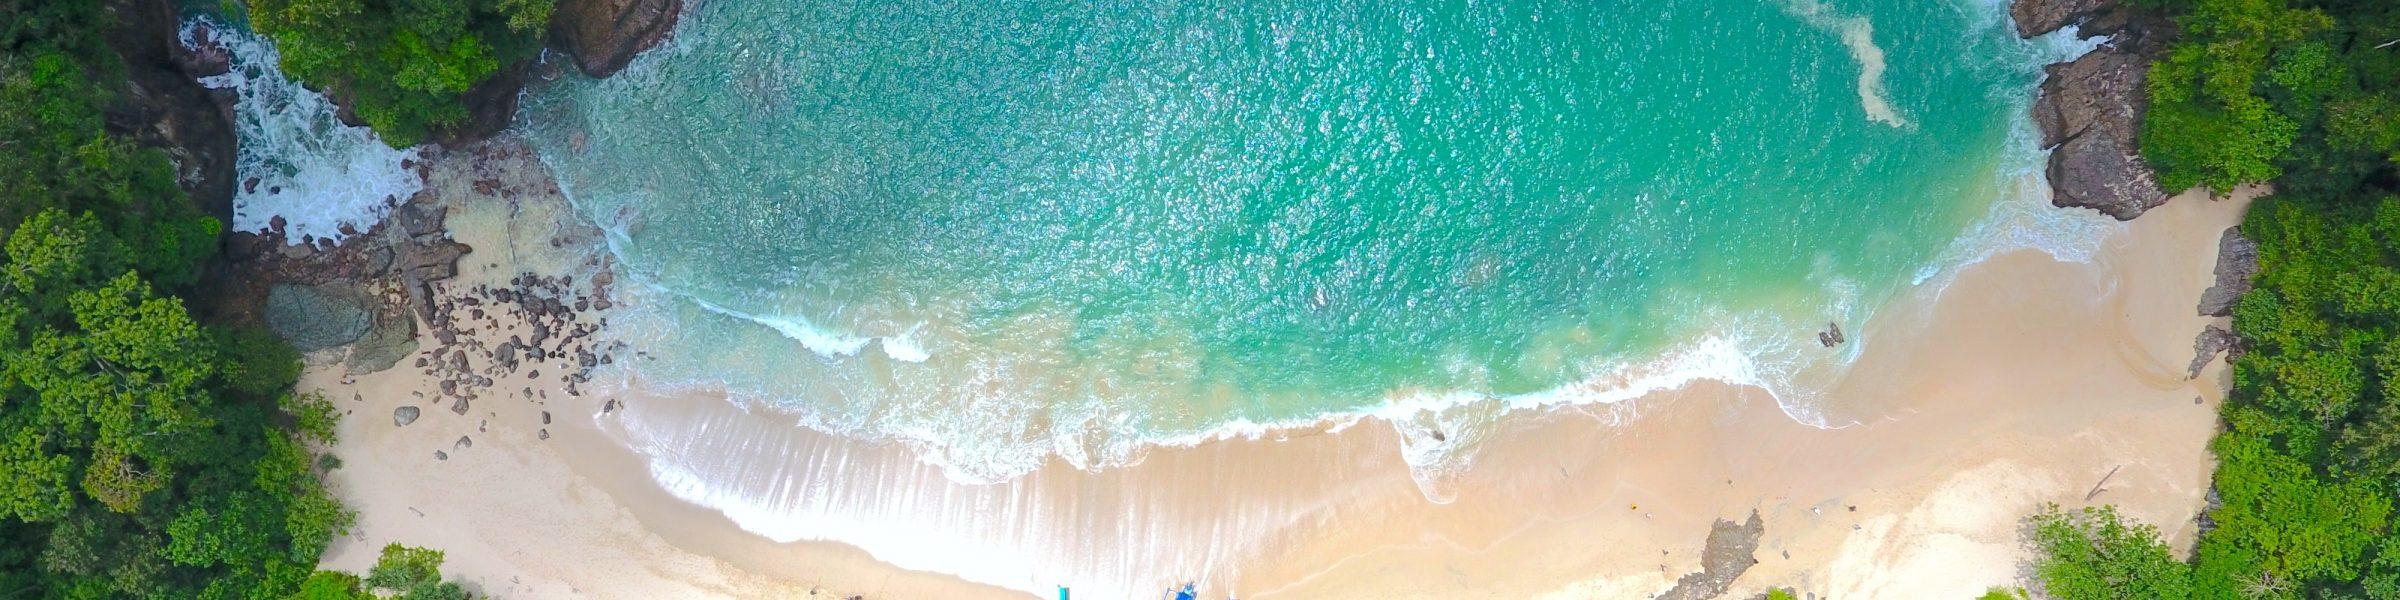 Bali and beyond fair travel 2019